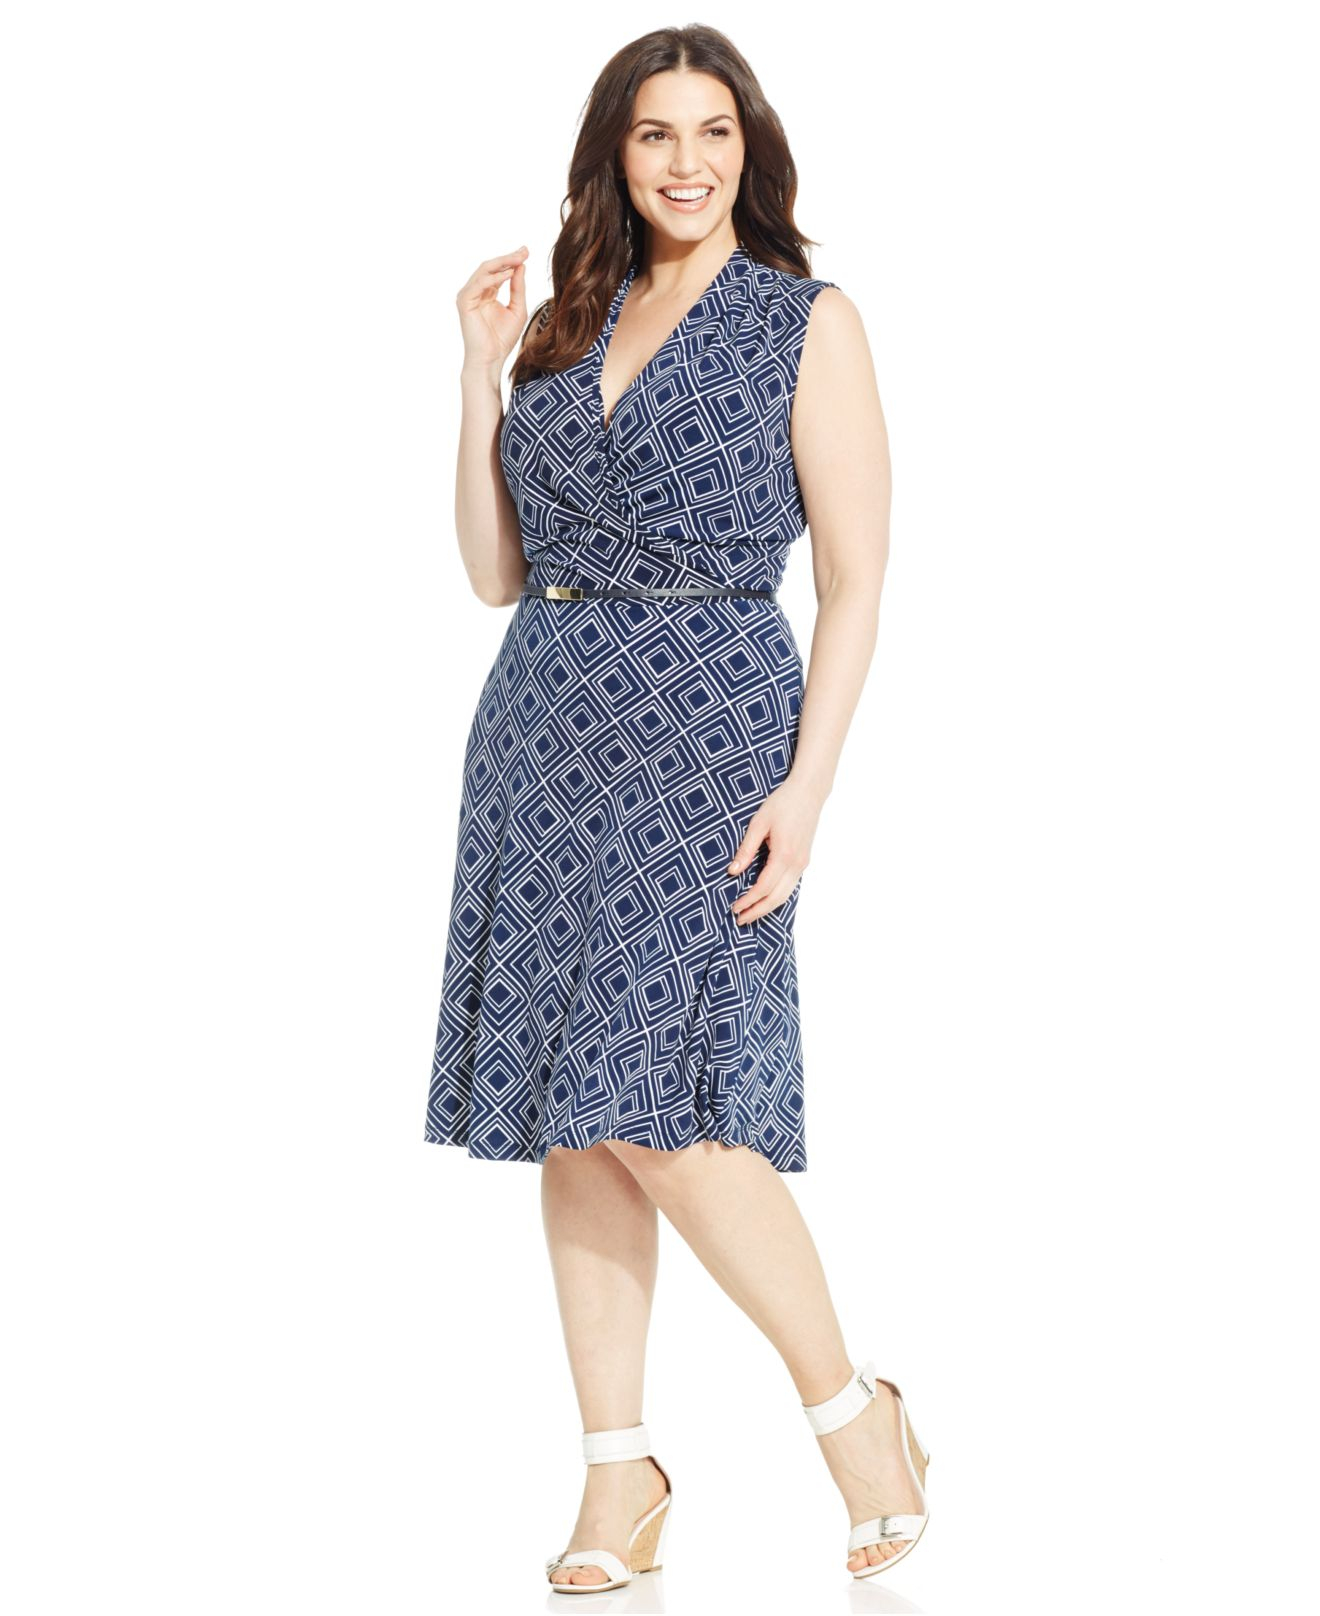 New York Plus Size Dresses – Fashion dresses